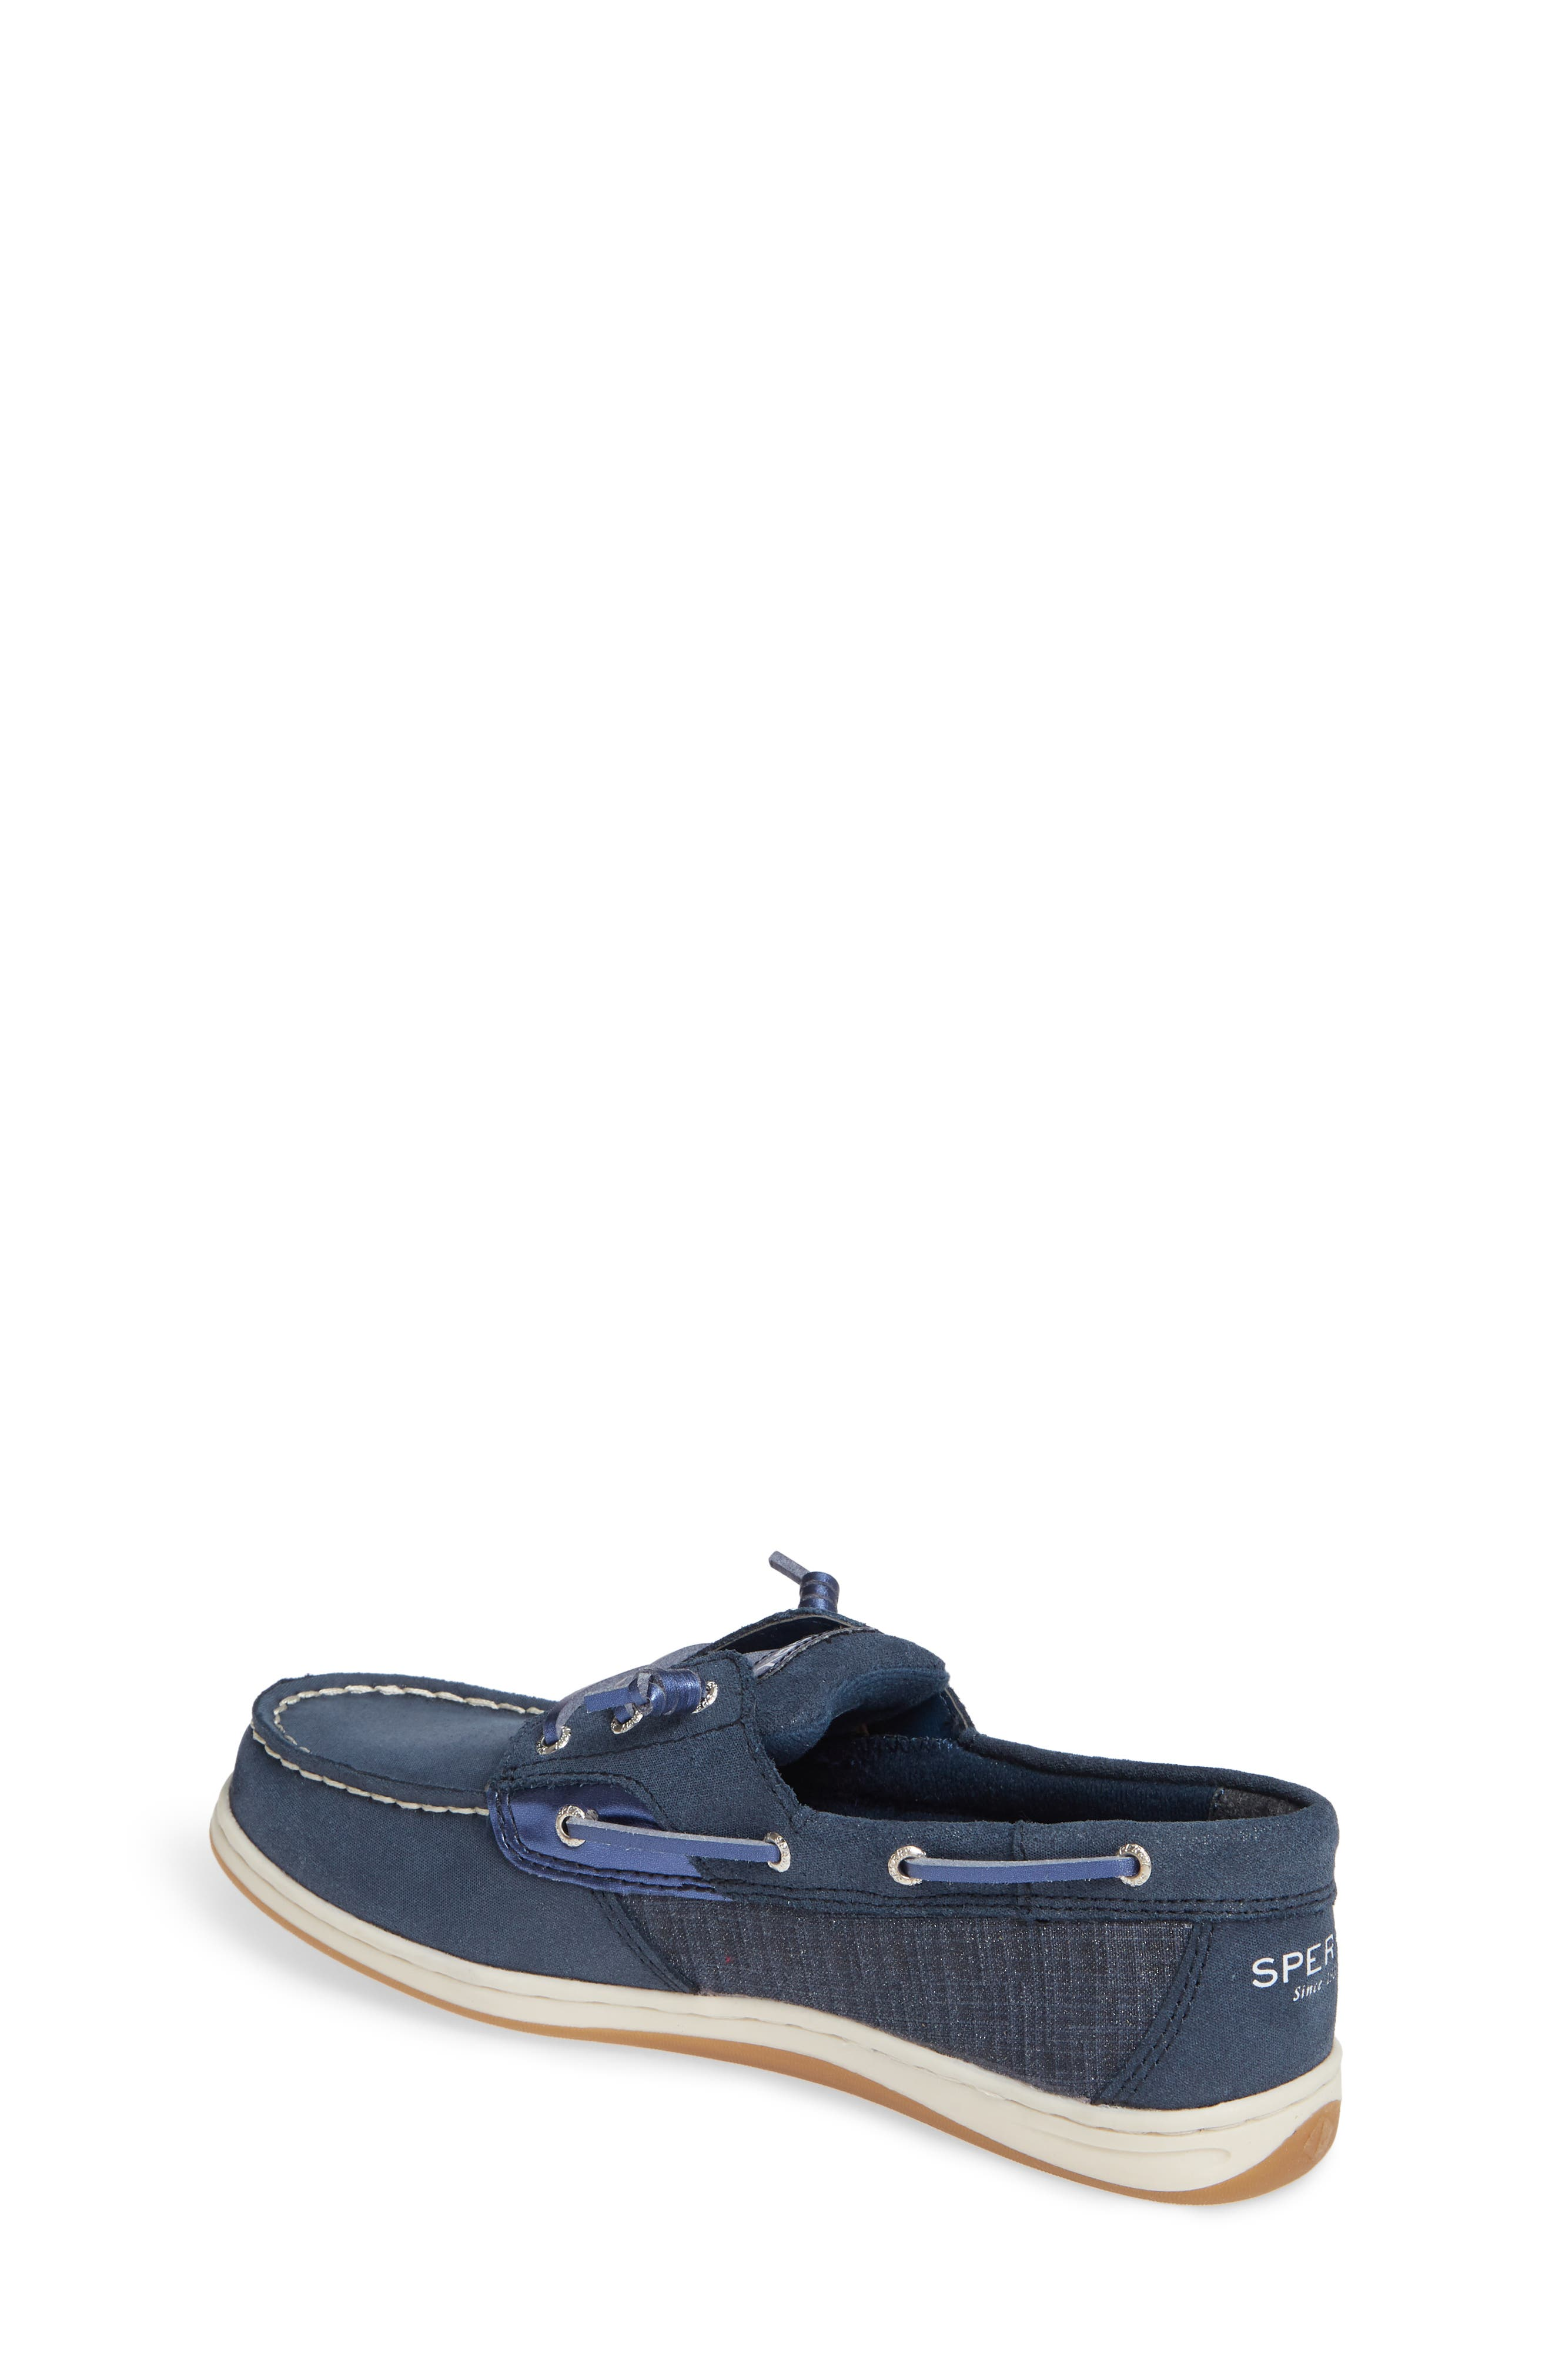 'Songfish Jr' Boat Shoe,                             Alternate thumbnail 2, color,                             410